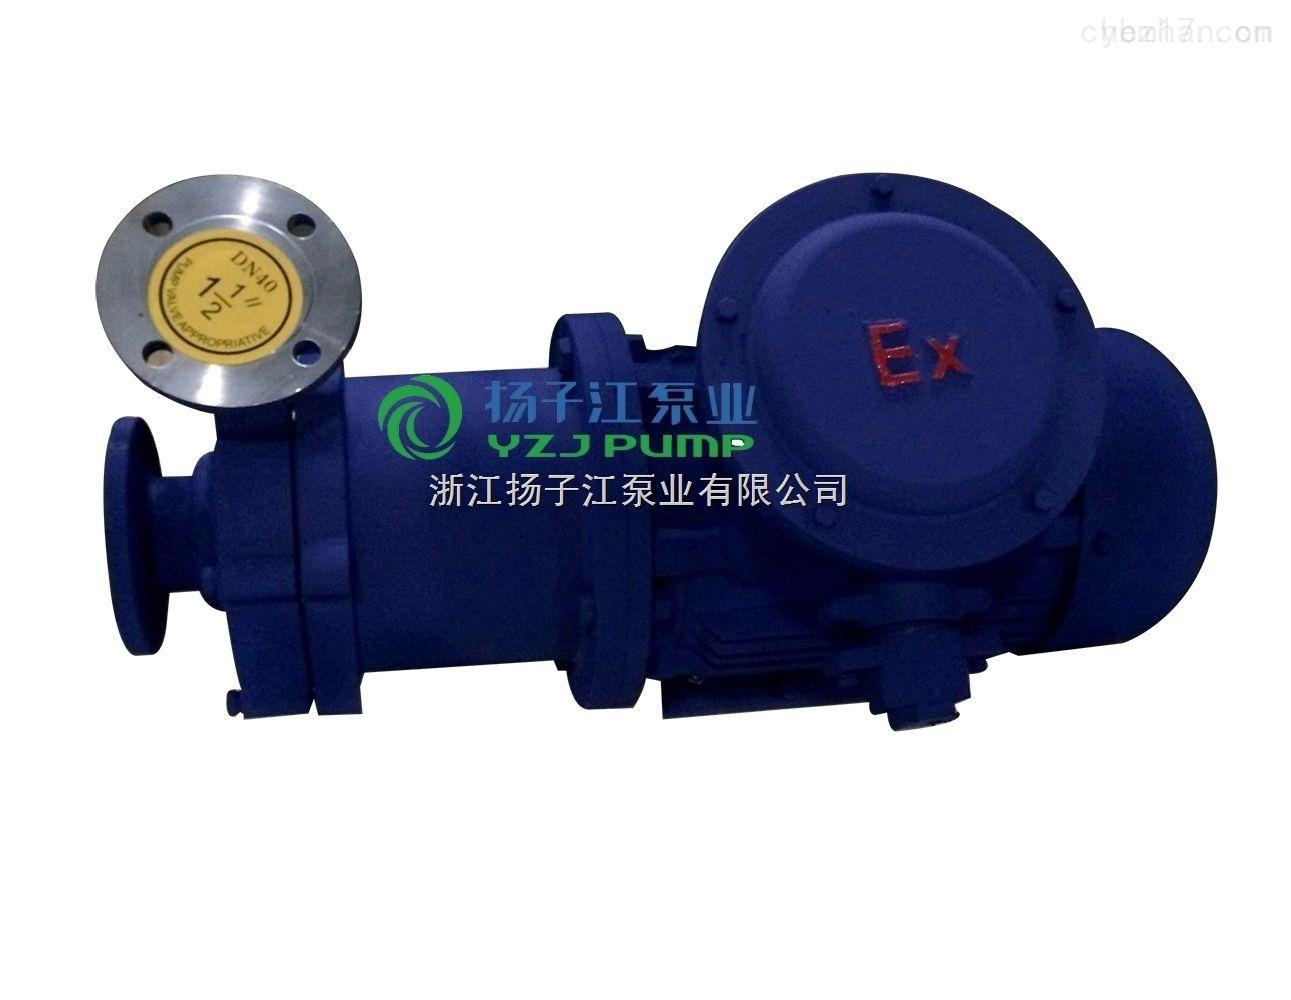 CQ磁力泵 磁力泵厂家 防爆磁力泵 不锈钢耐酸耐碱磁力泵*